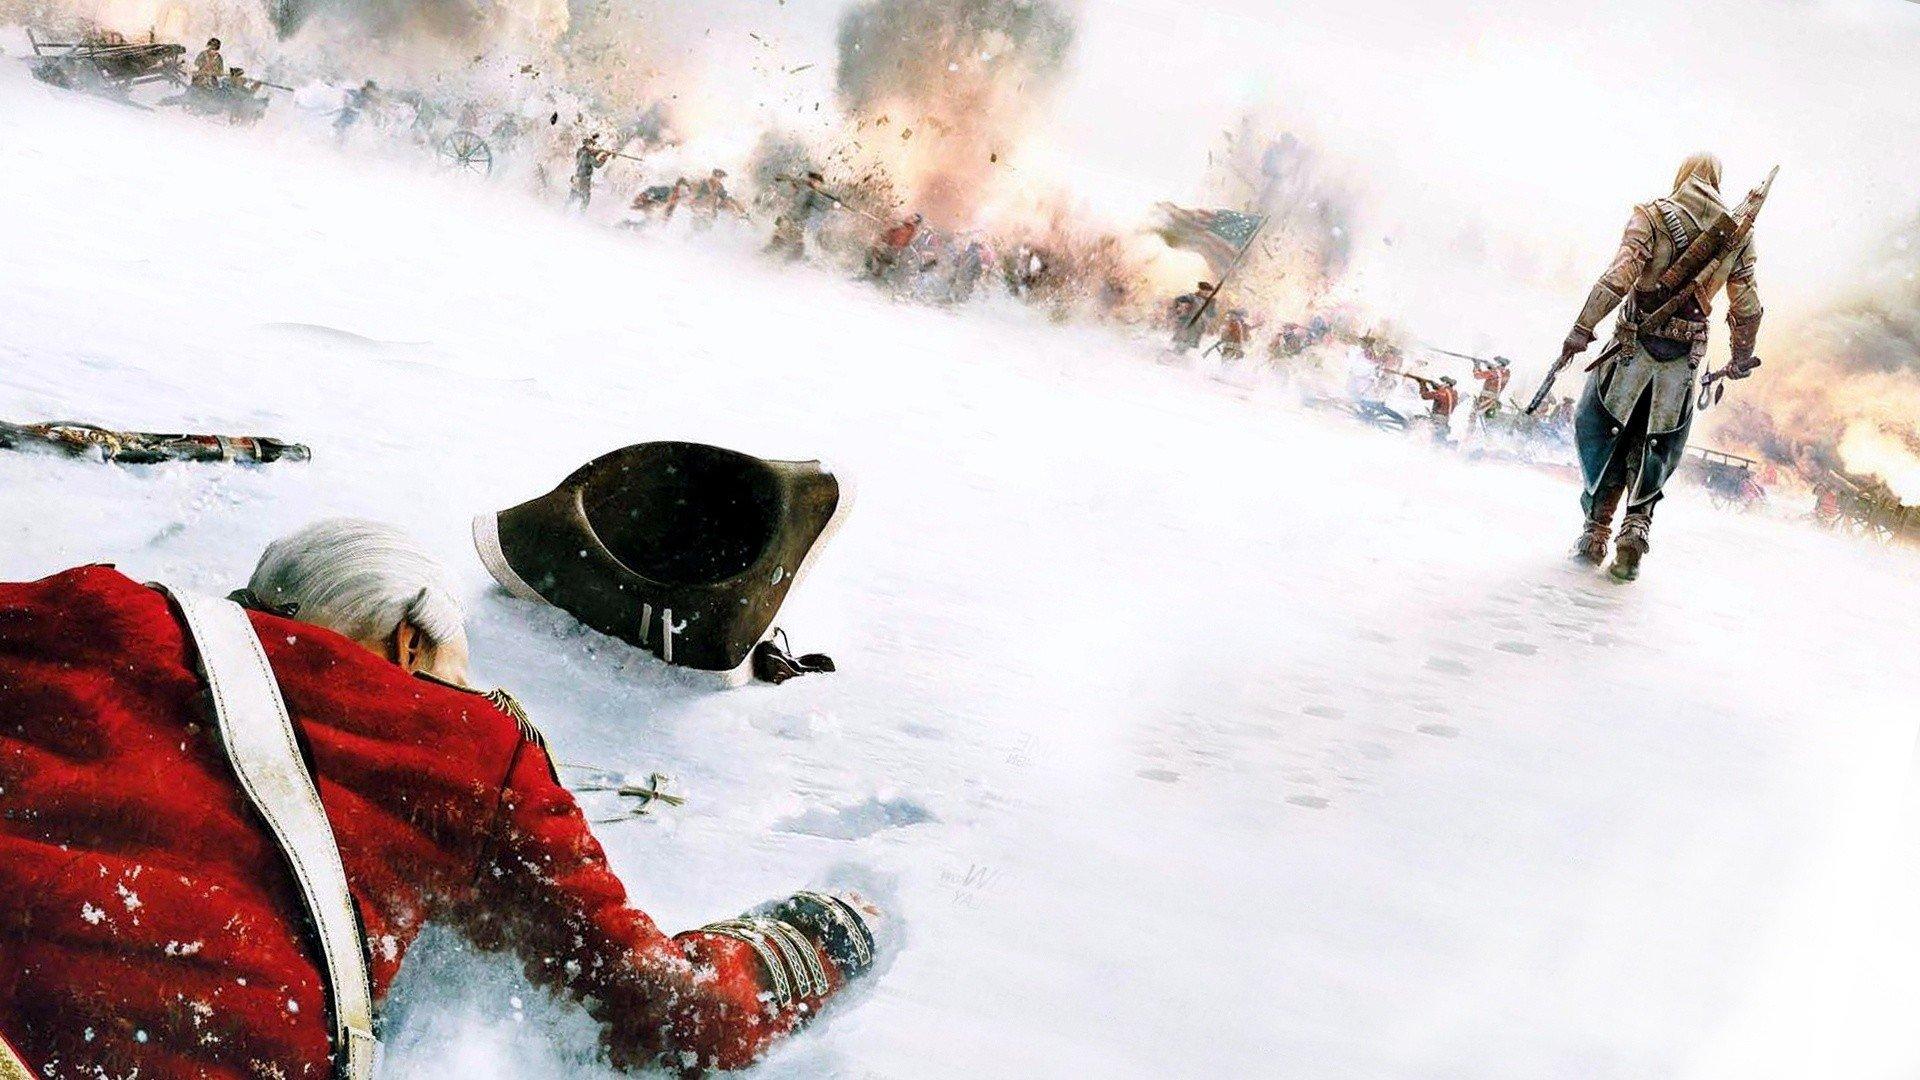 190 Assassins Creed III HD Wallpapers